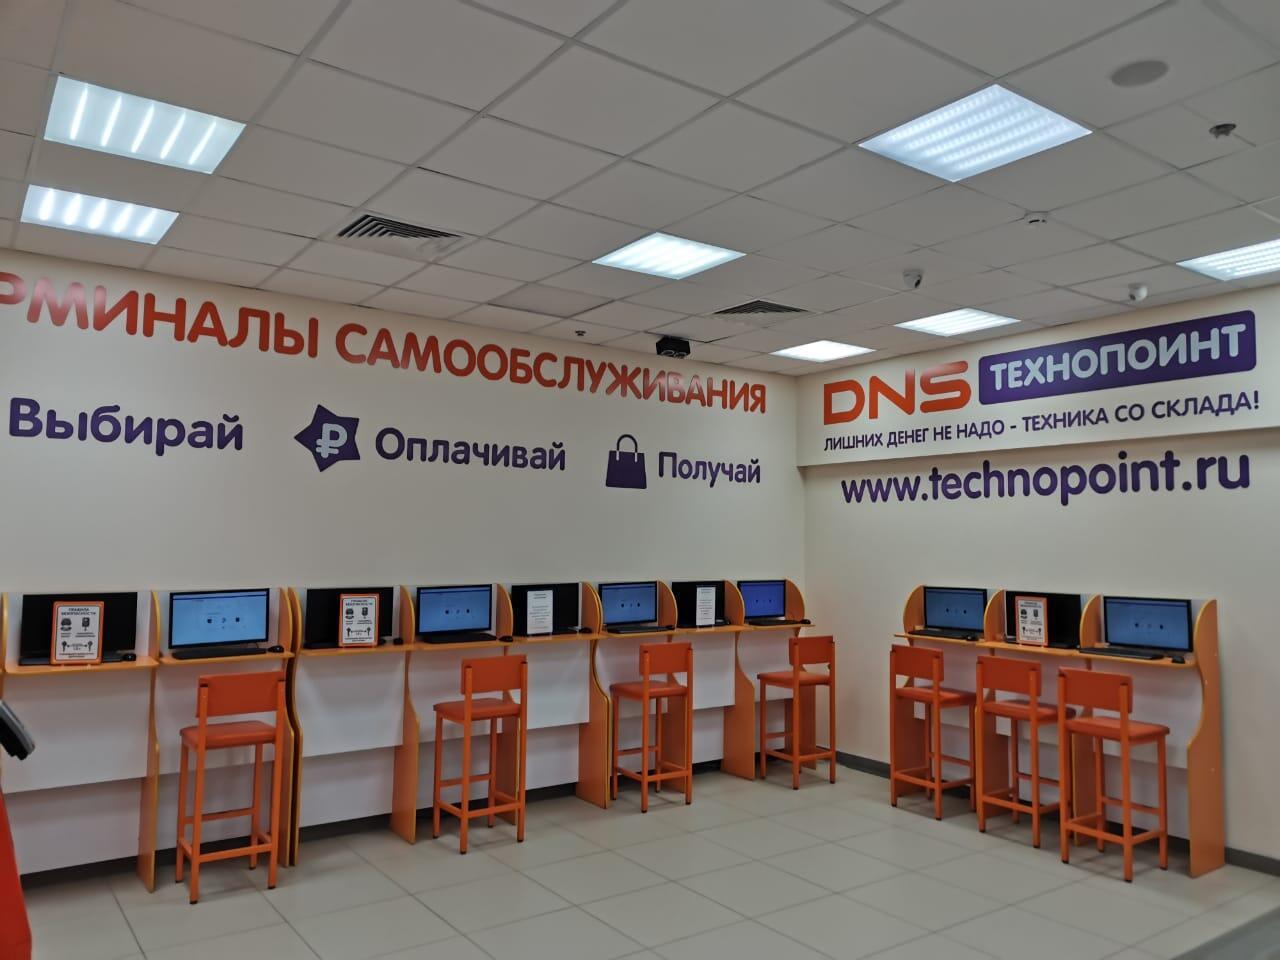 Технопоинт Киров Интернет Магазин Каталог